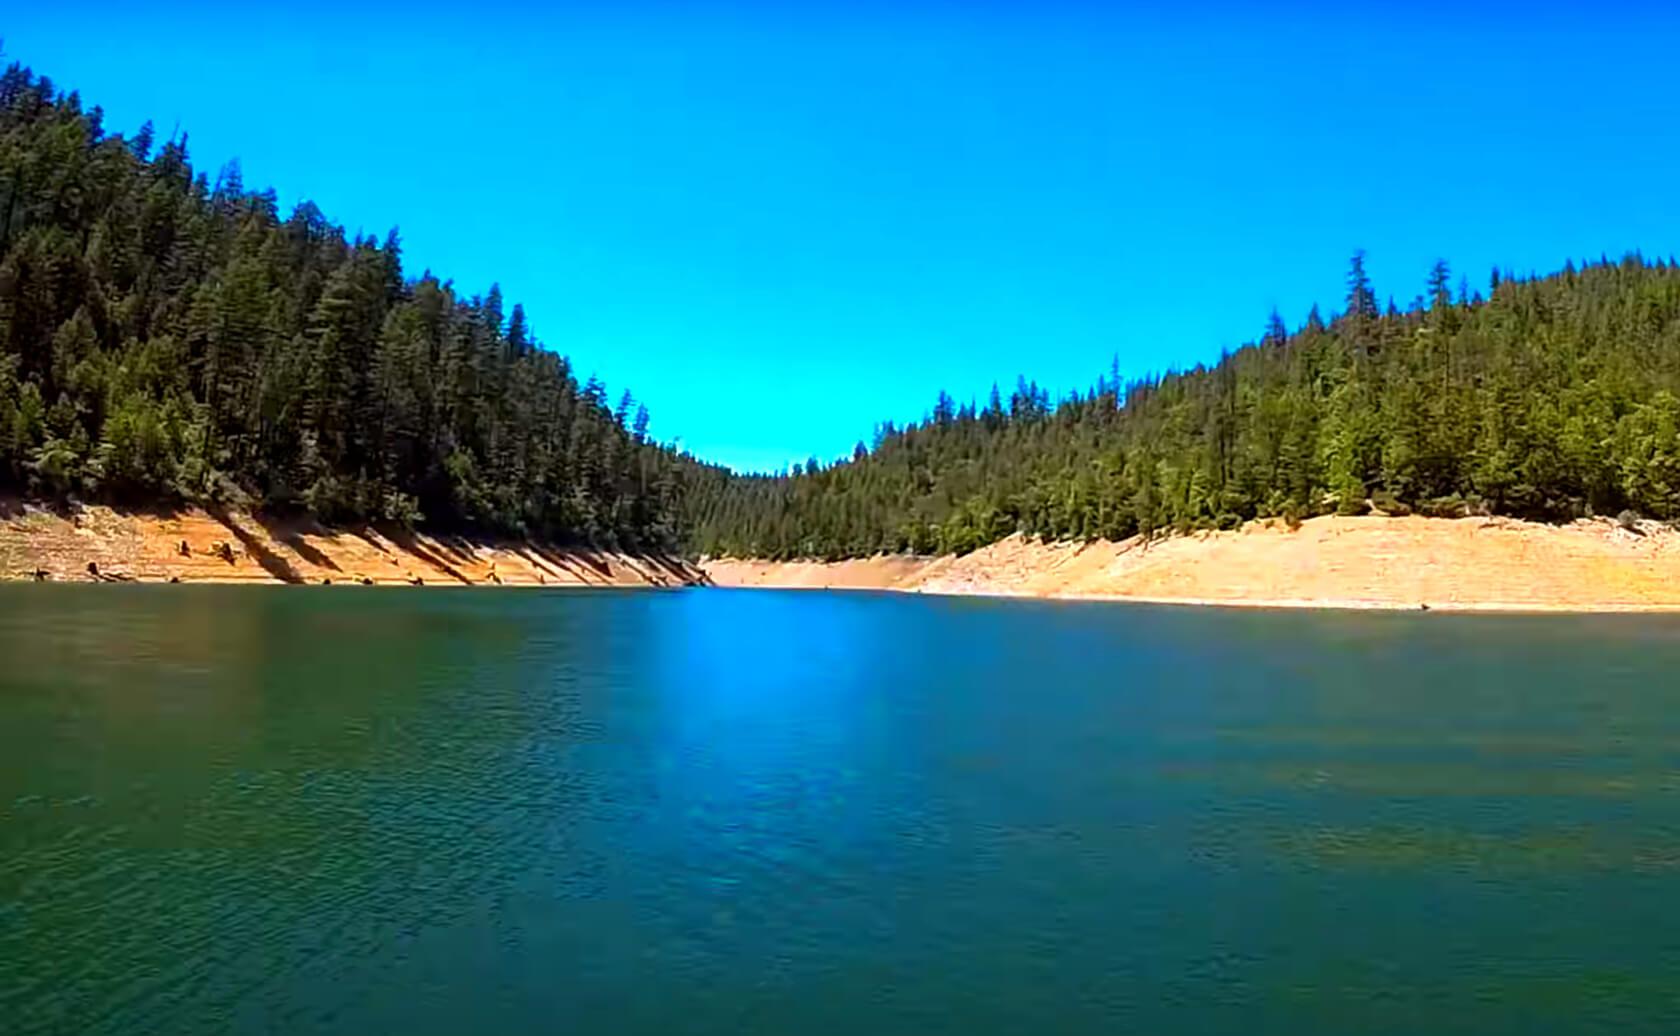 Trinity-Lake-Fishing-Guide-Report-California-03